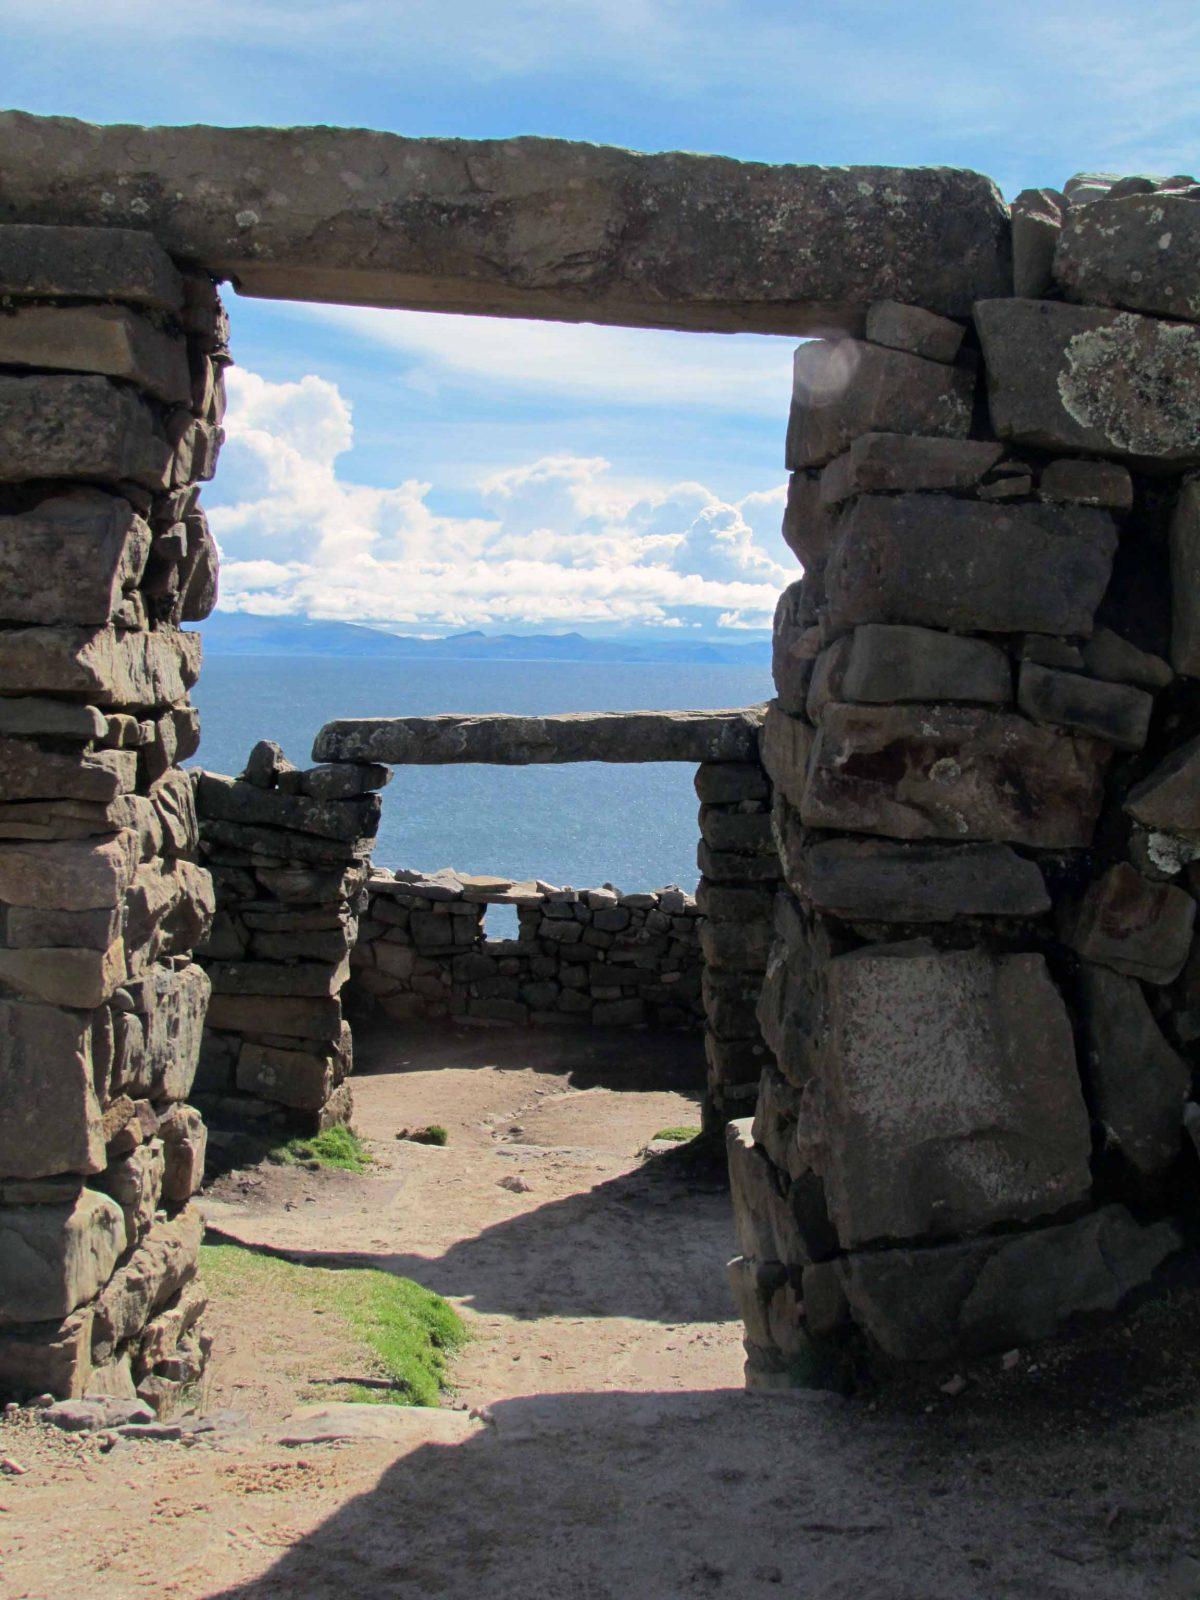 Archways at the Chicana ruins, Isla del Sol, Bolivia | ©Angela Drake